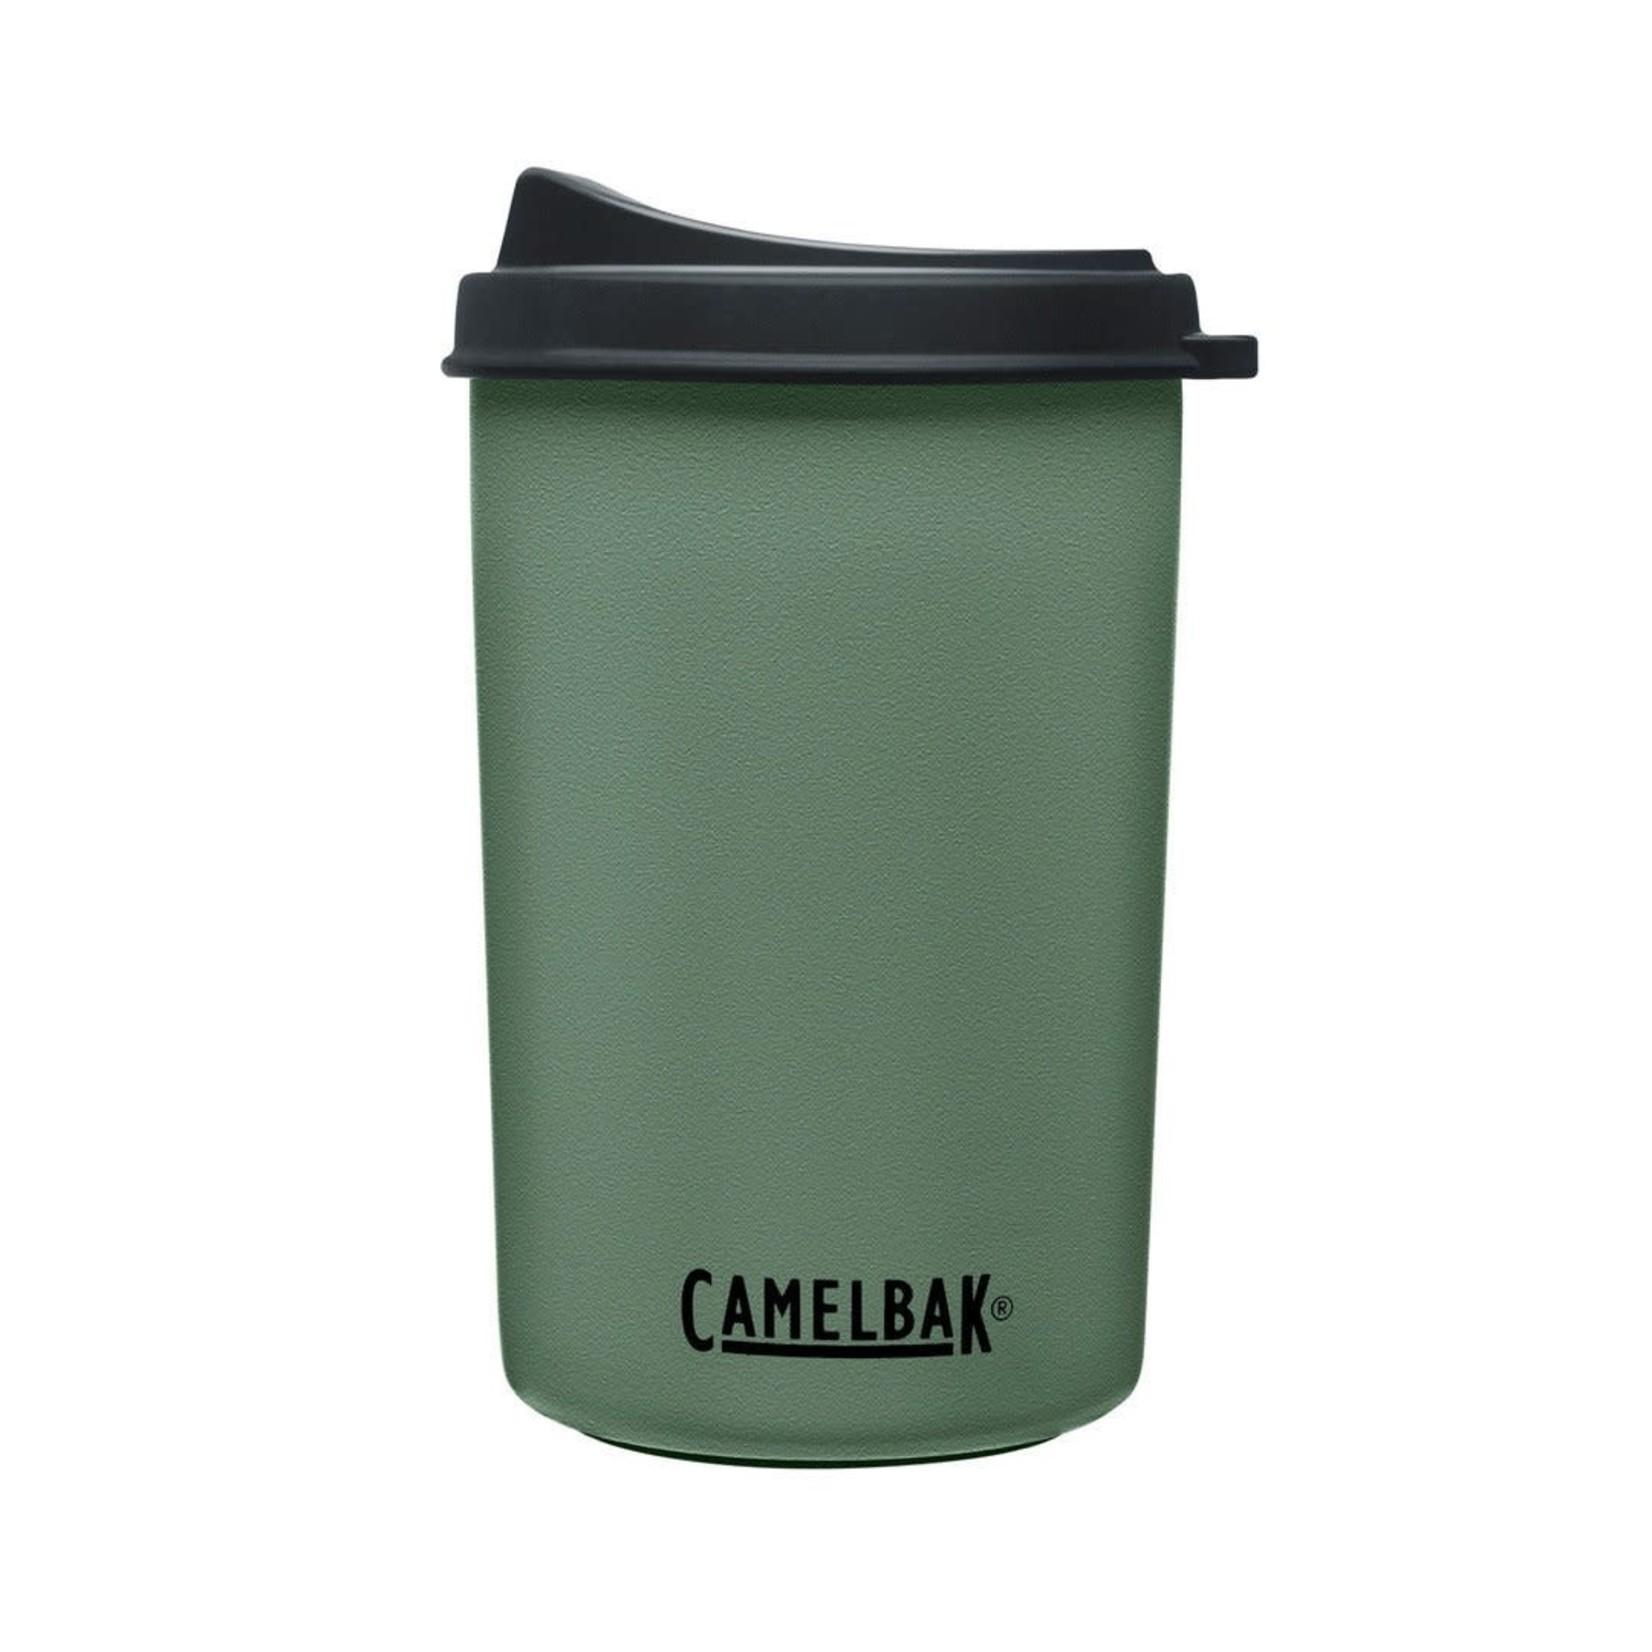 CAMELBAK CAMELBAK - borraccia MultiBev V.I. 0.5L - Moss